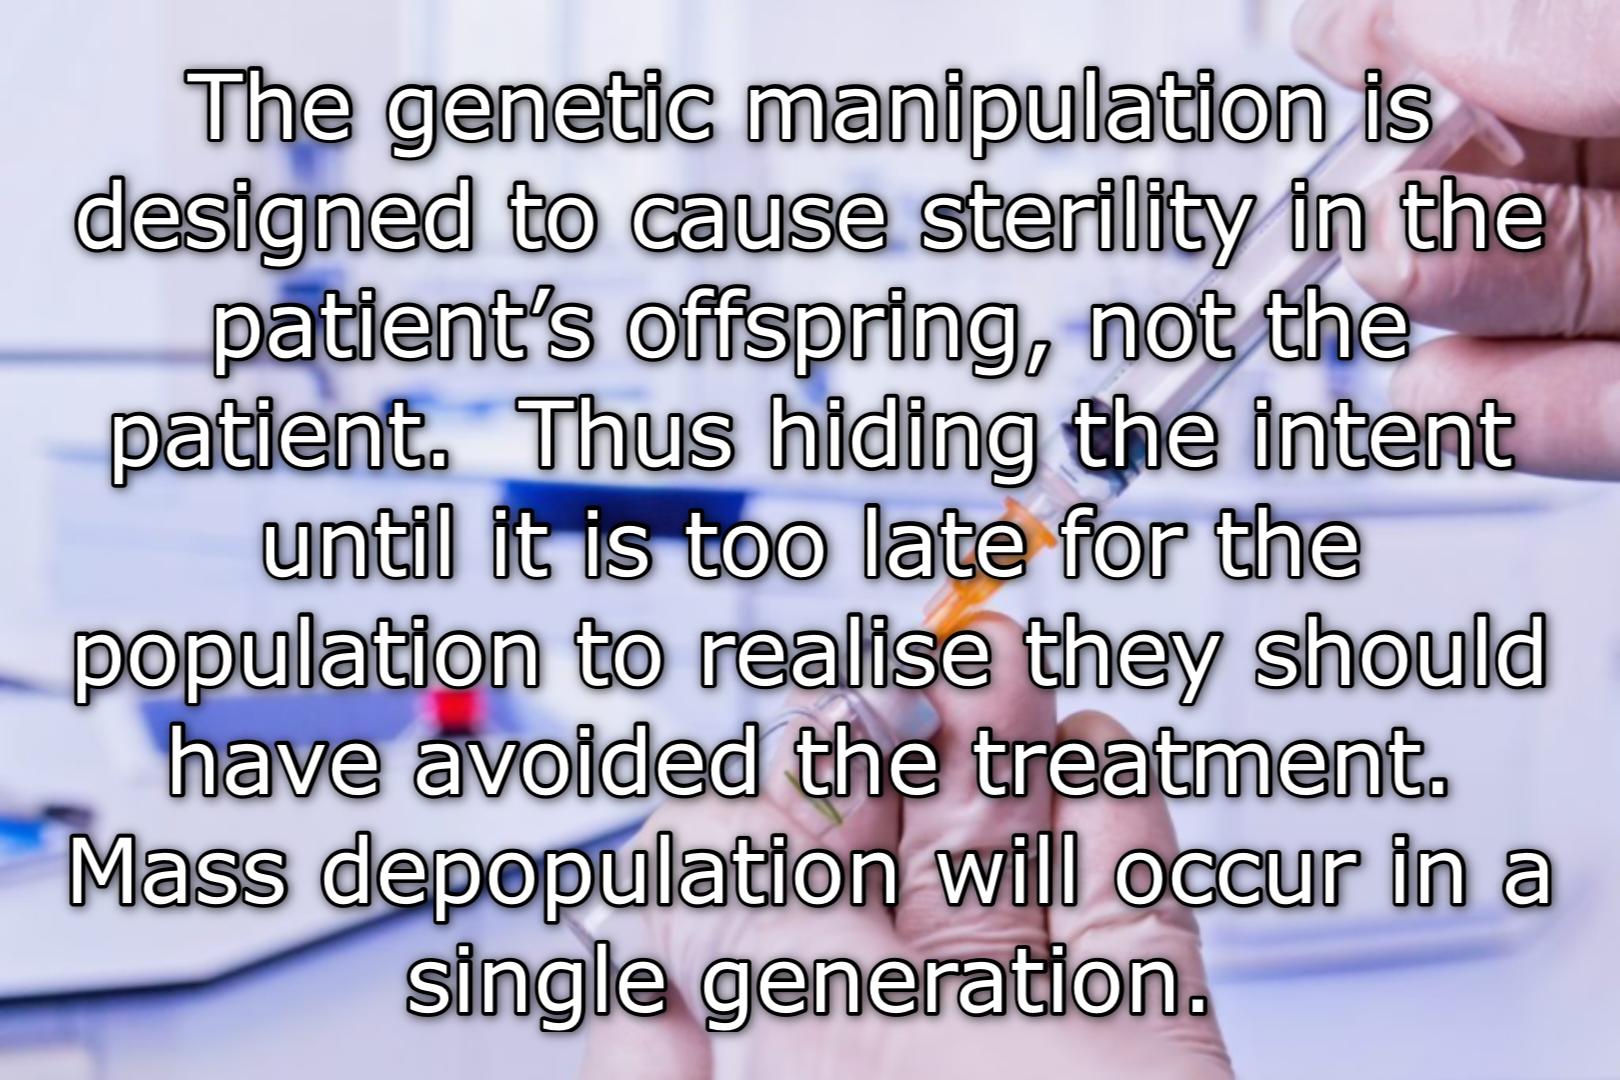 Depopulation through sterilisation